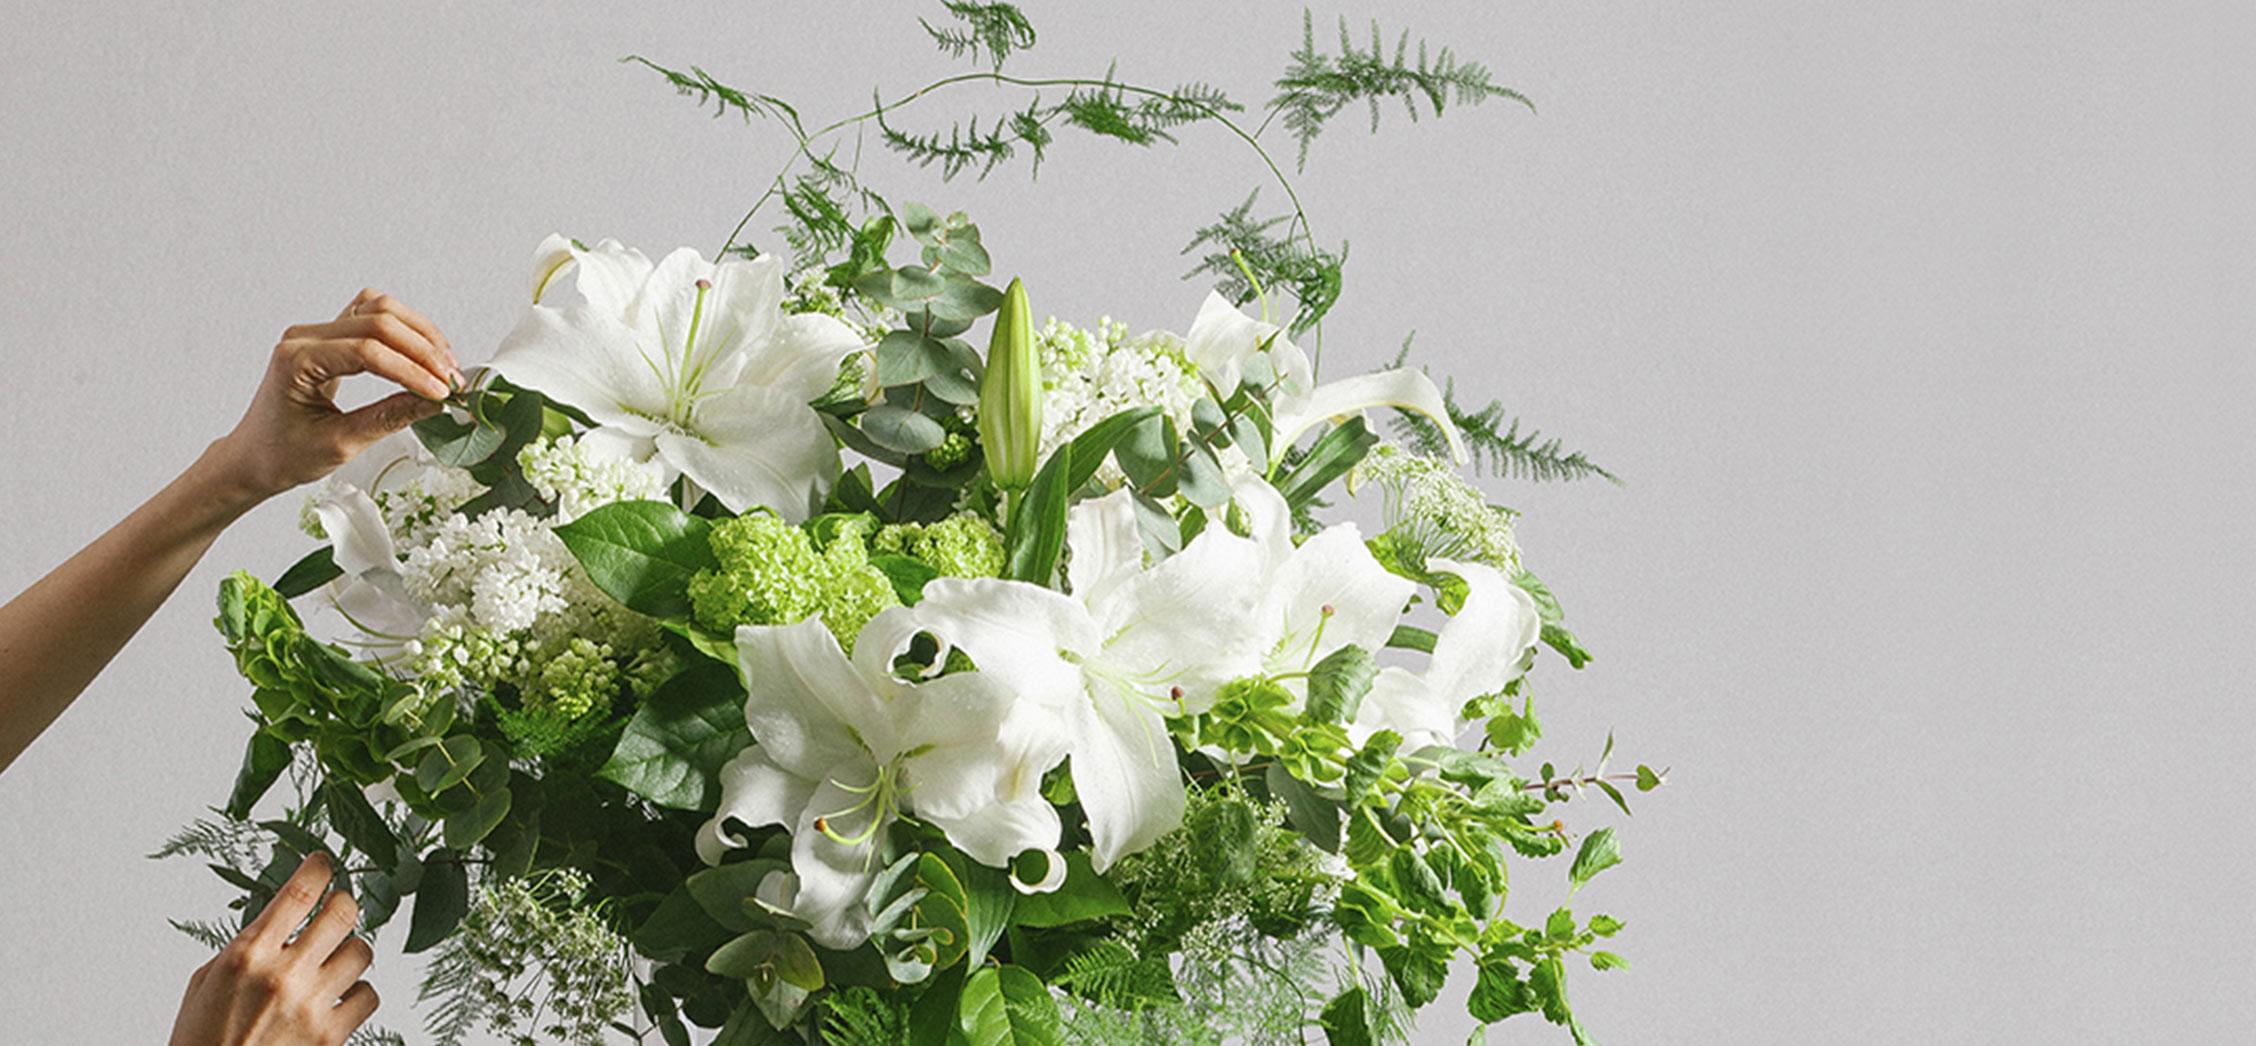 Florist arranging a premium flower bouquet of casablanca lilies. Featuring bespoke bouquet 12.